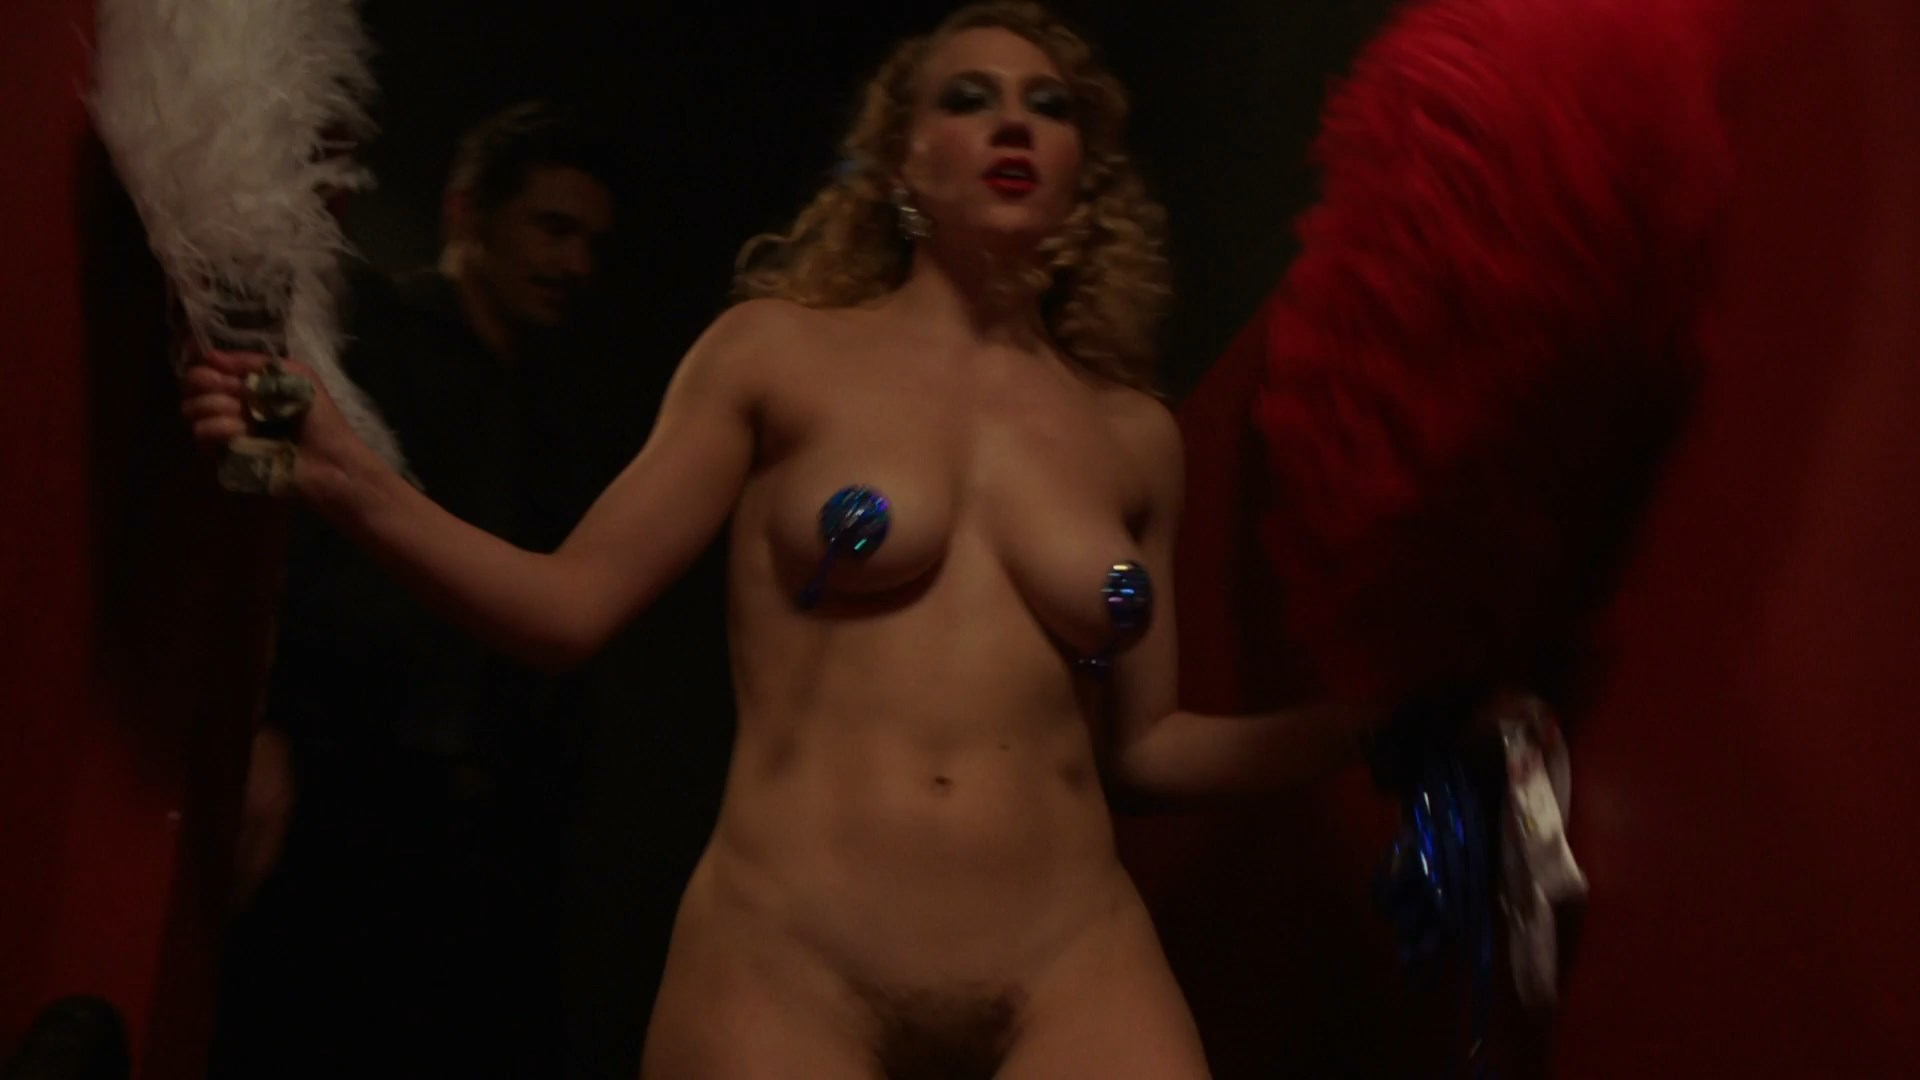 Kat cunning tits - 2019 year